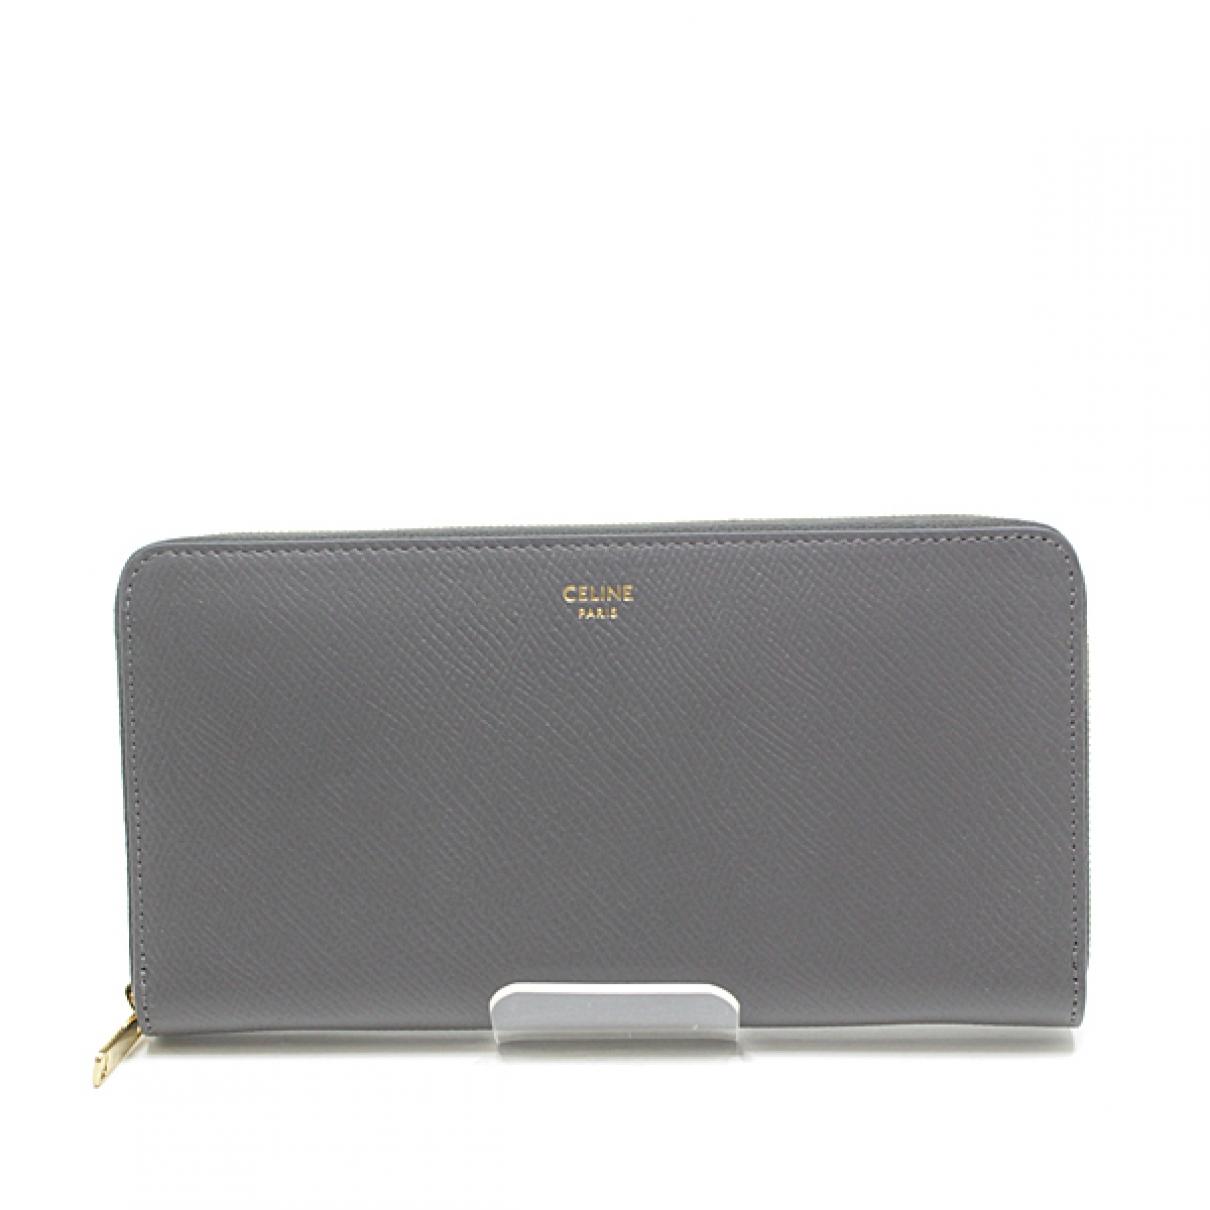 Celine \N Grey Leather wallet for Women \N